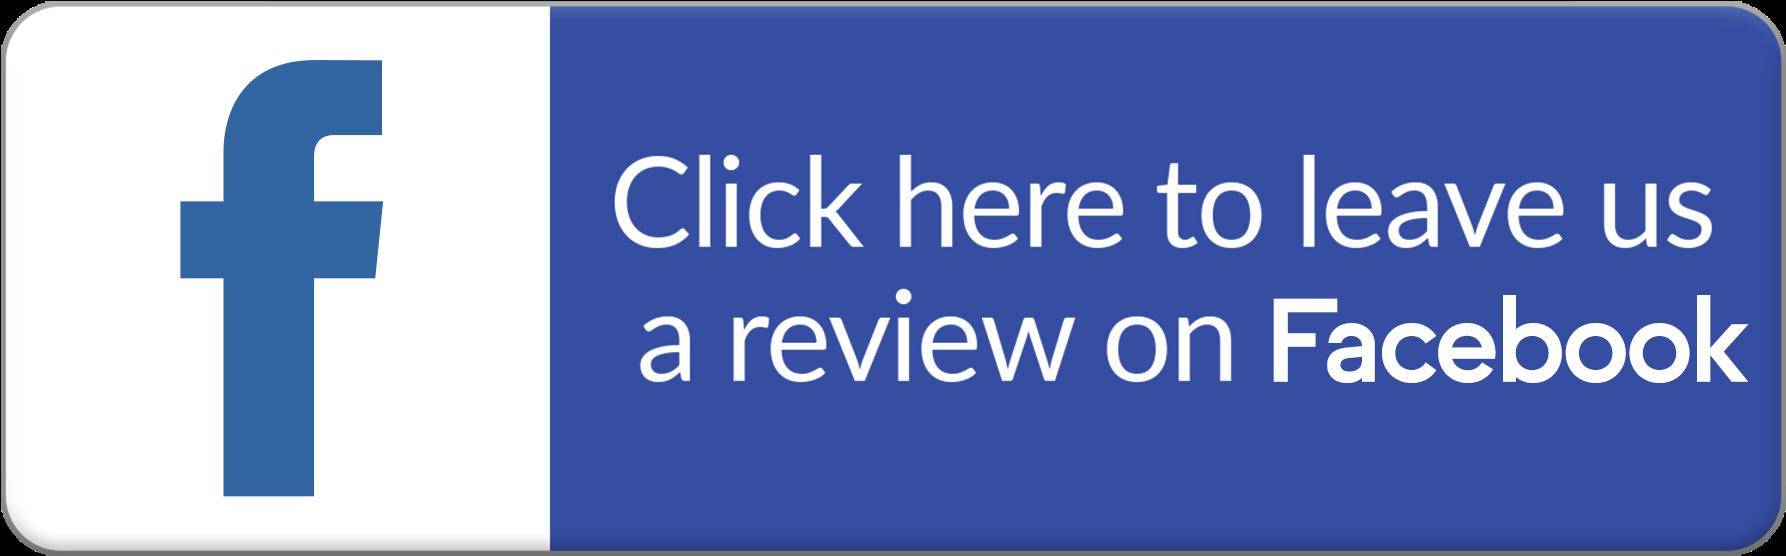 Flamingo Cafes: Leave A Facebook Review